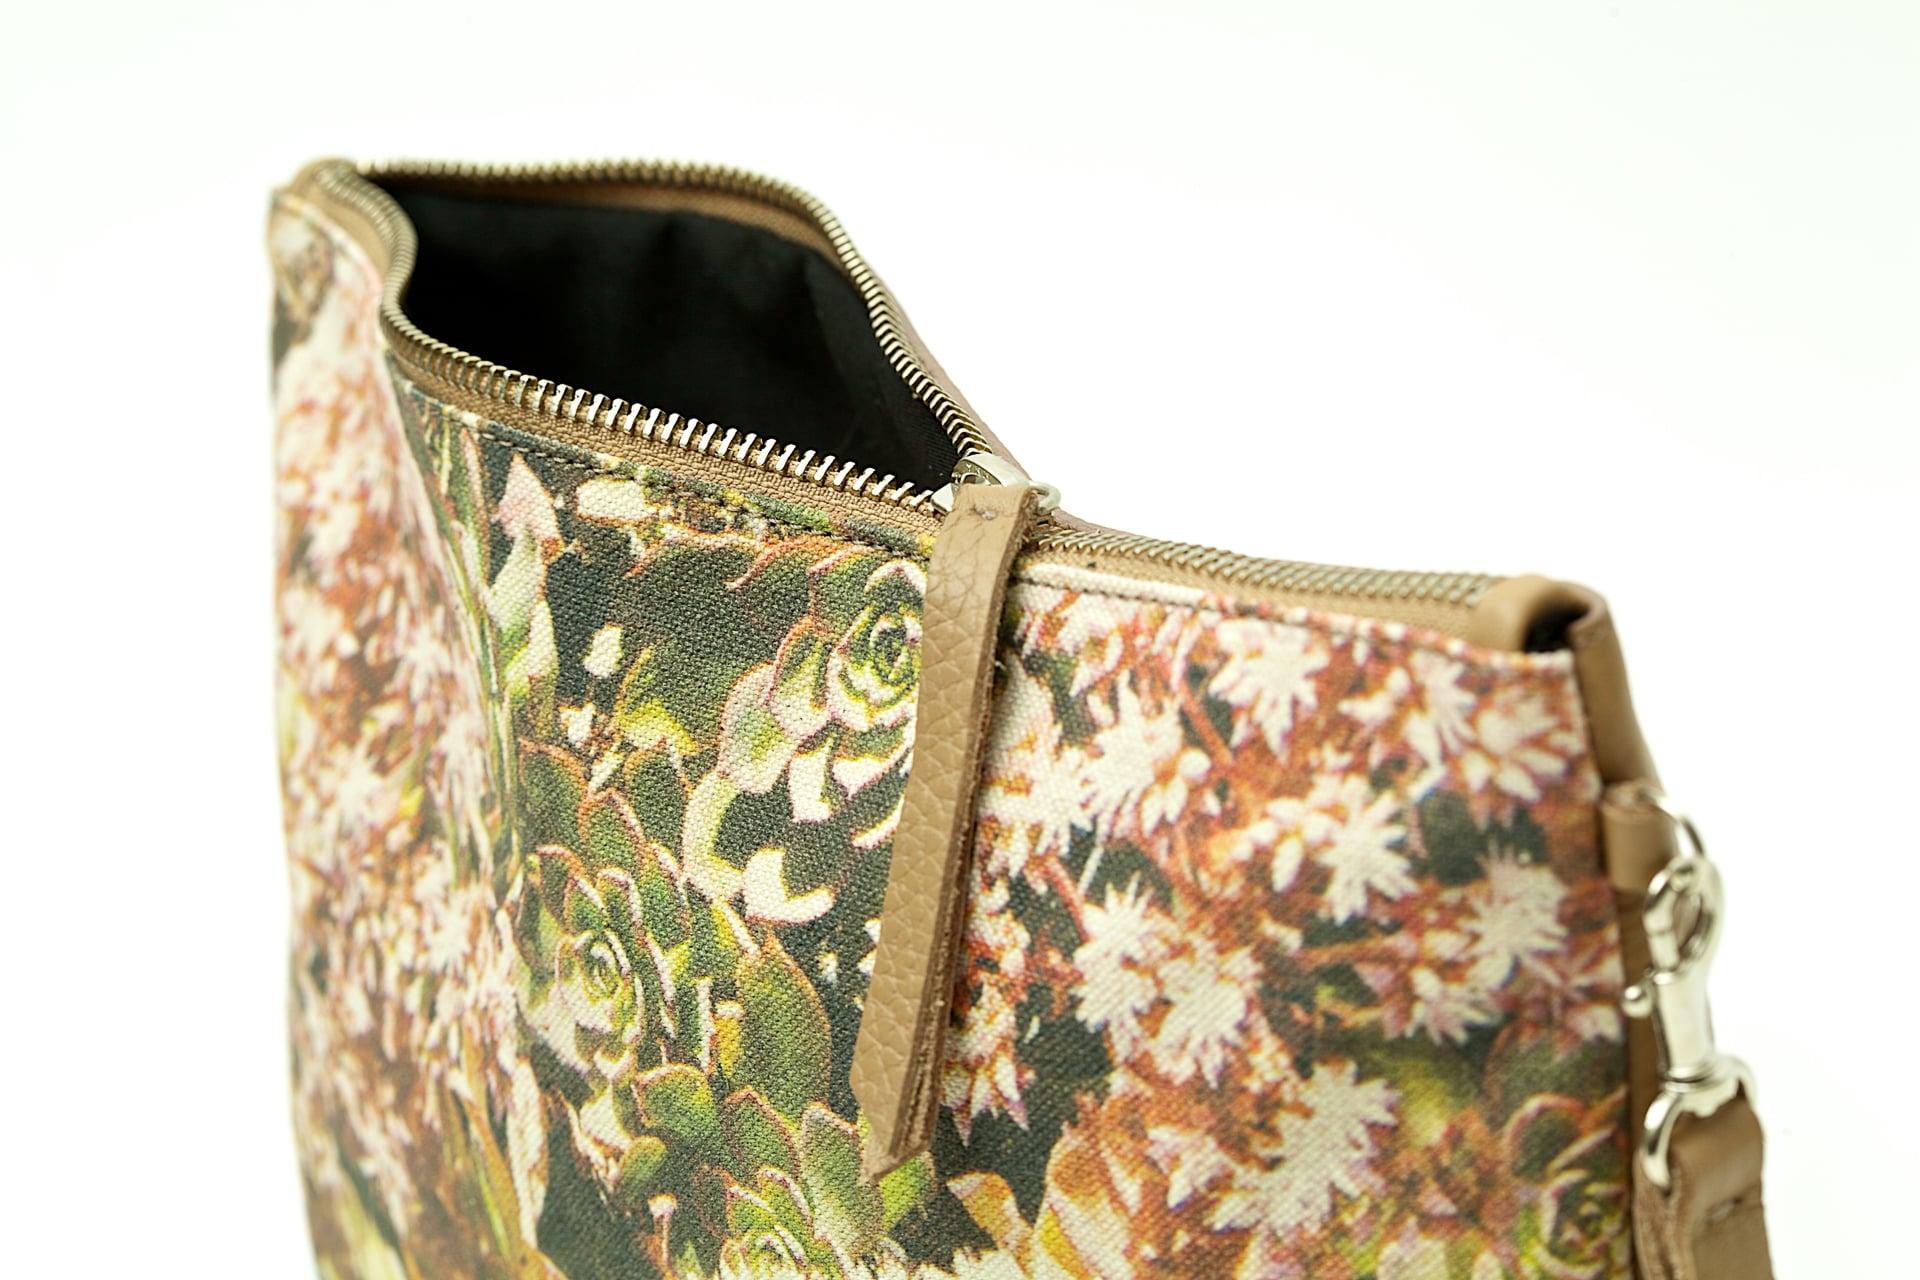 Aeonium-Percarneum-or-Bejeque-Rosado-detail-handbag